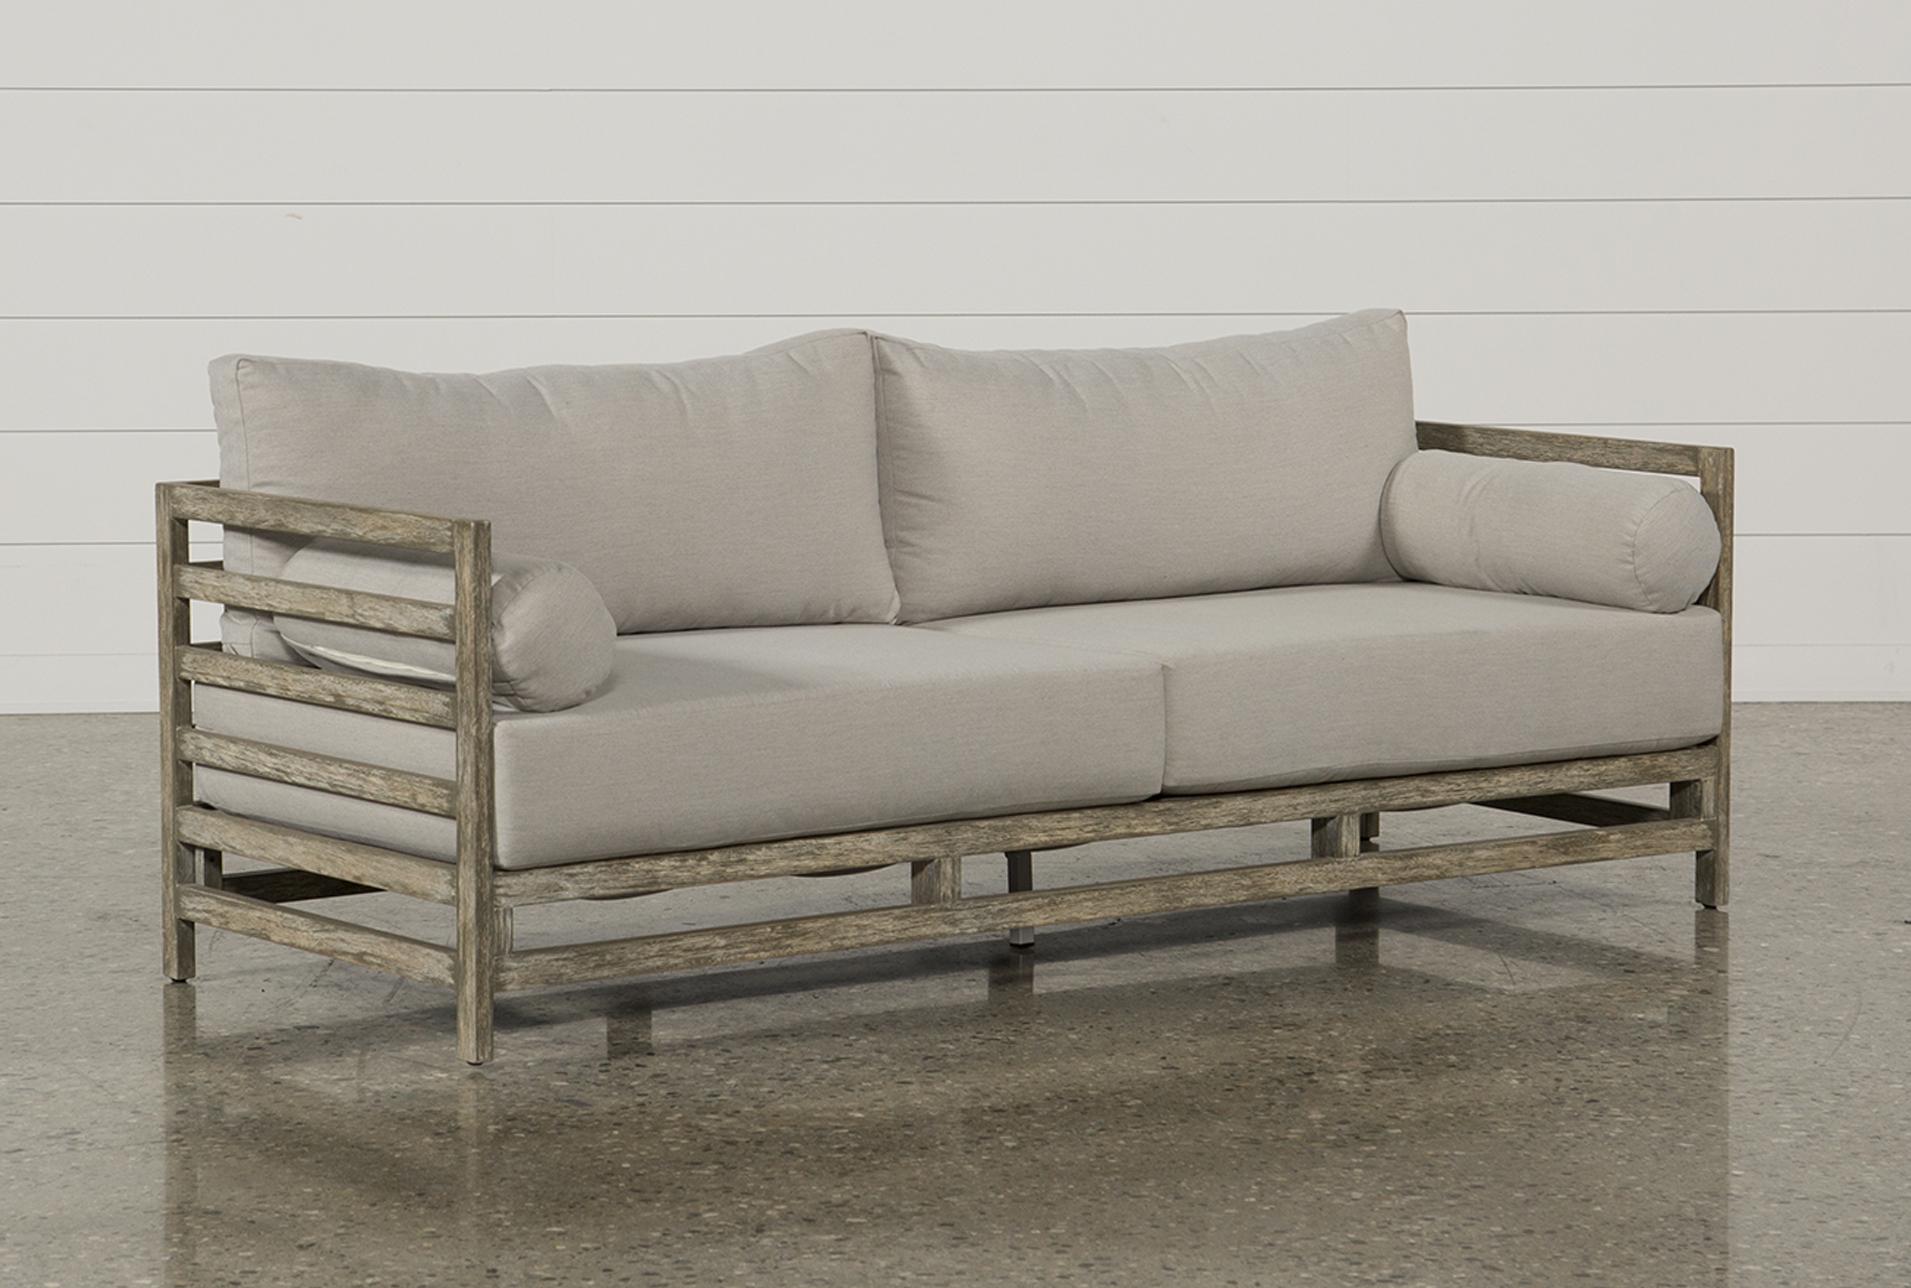 outdoor sofa outdoor pompeii sofa - 360 SOBOTZP